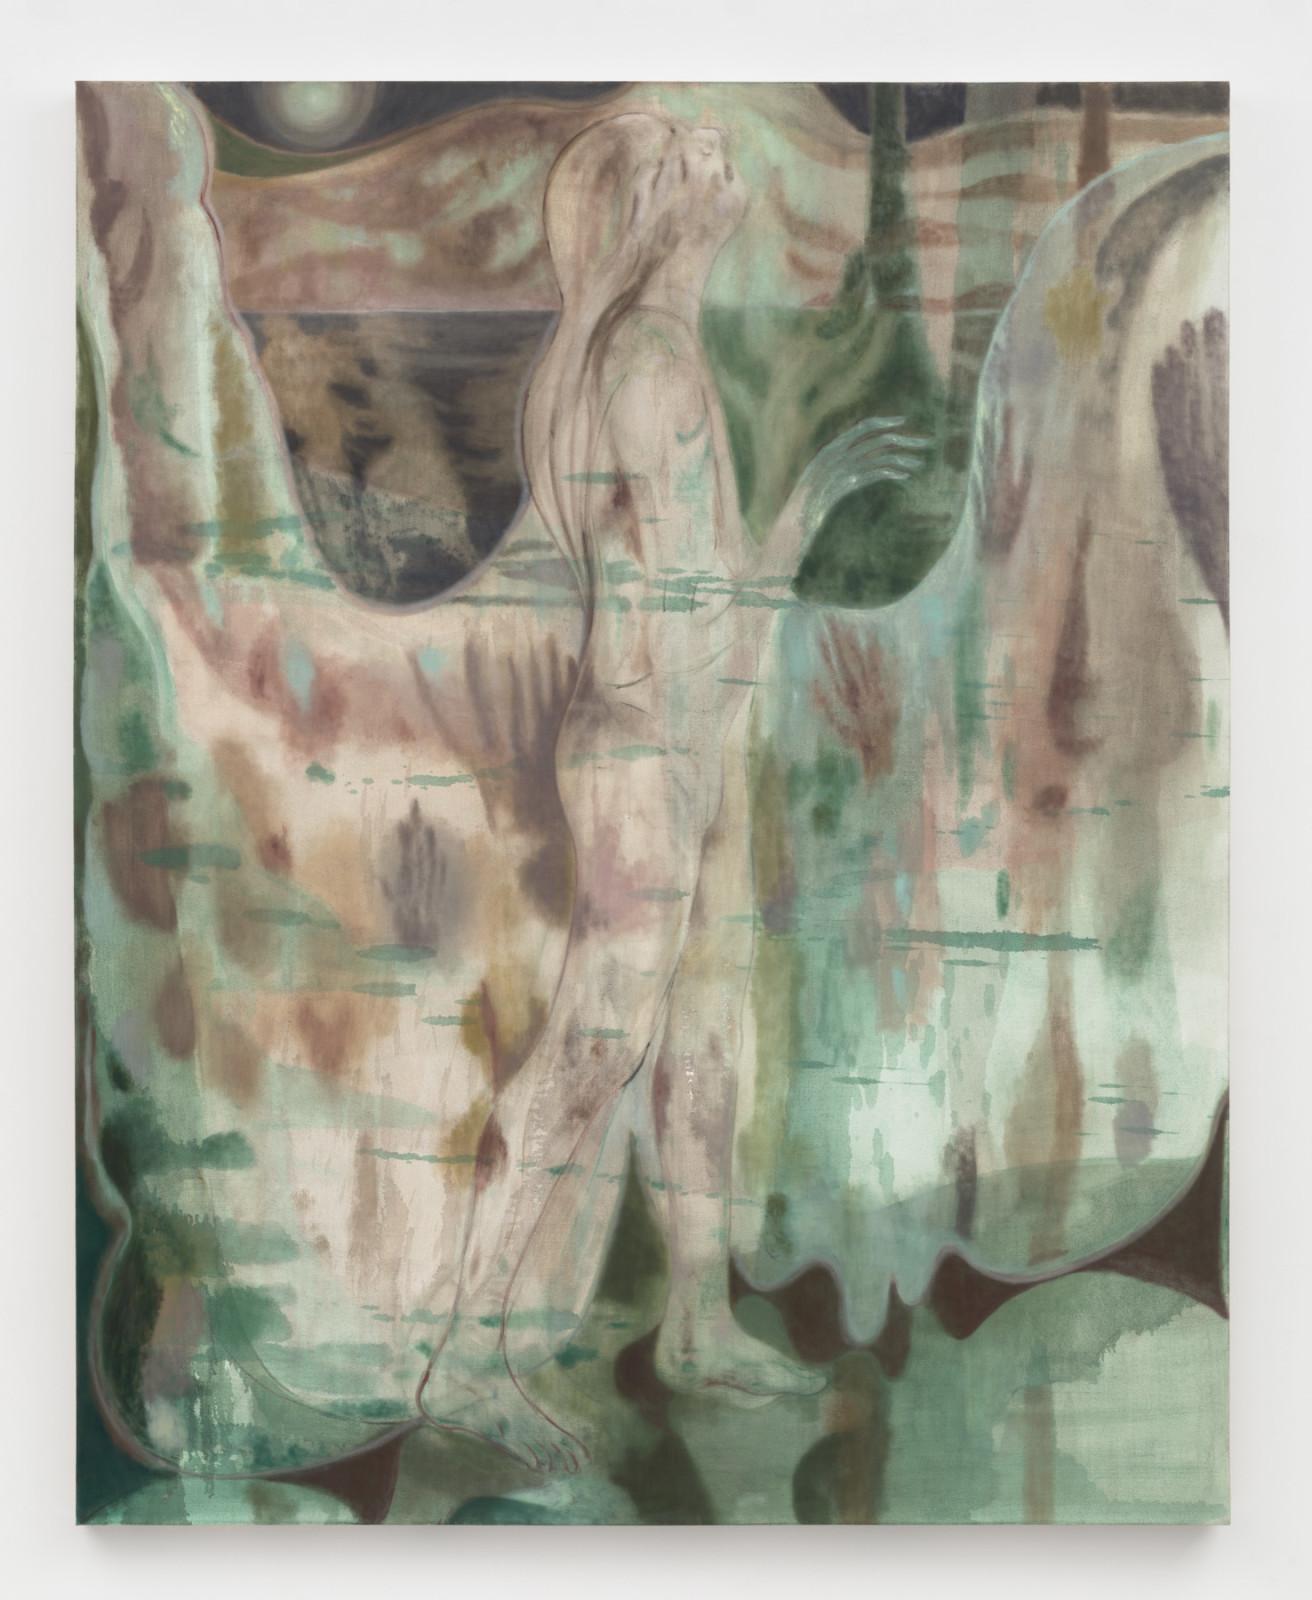 "<div class=""artist""><strong>Maja Ruznic</strong></div> <div class=""title""><em>The Call</em>, 2019</div> <div class=""medium"">Oil on canvas</div> <div class=""dimensions"">205.7 x 165.1 cm<br /> 81 x 65 in</div>"